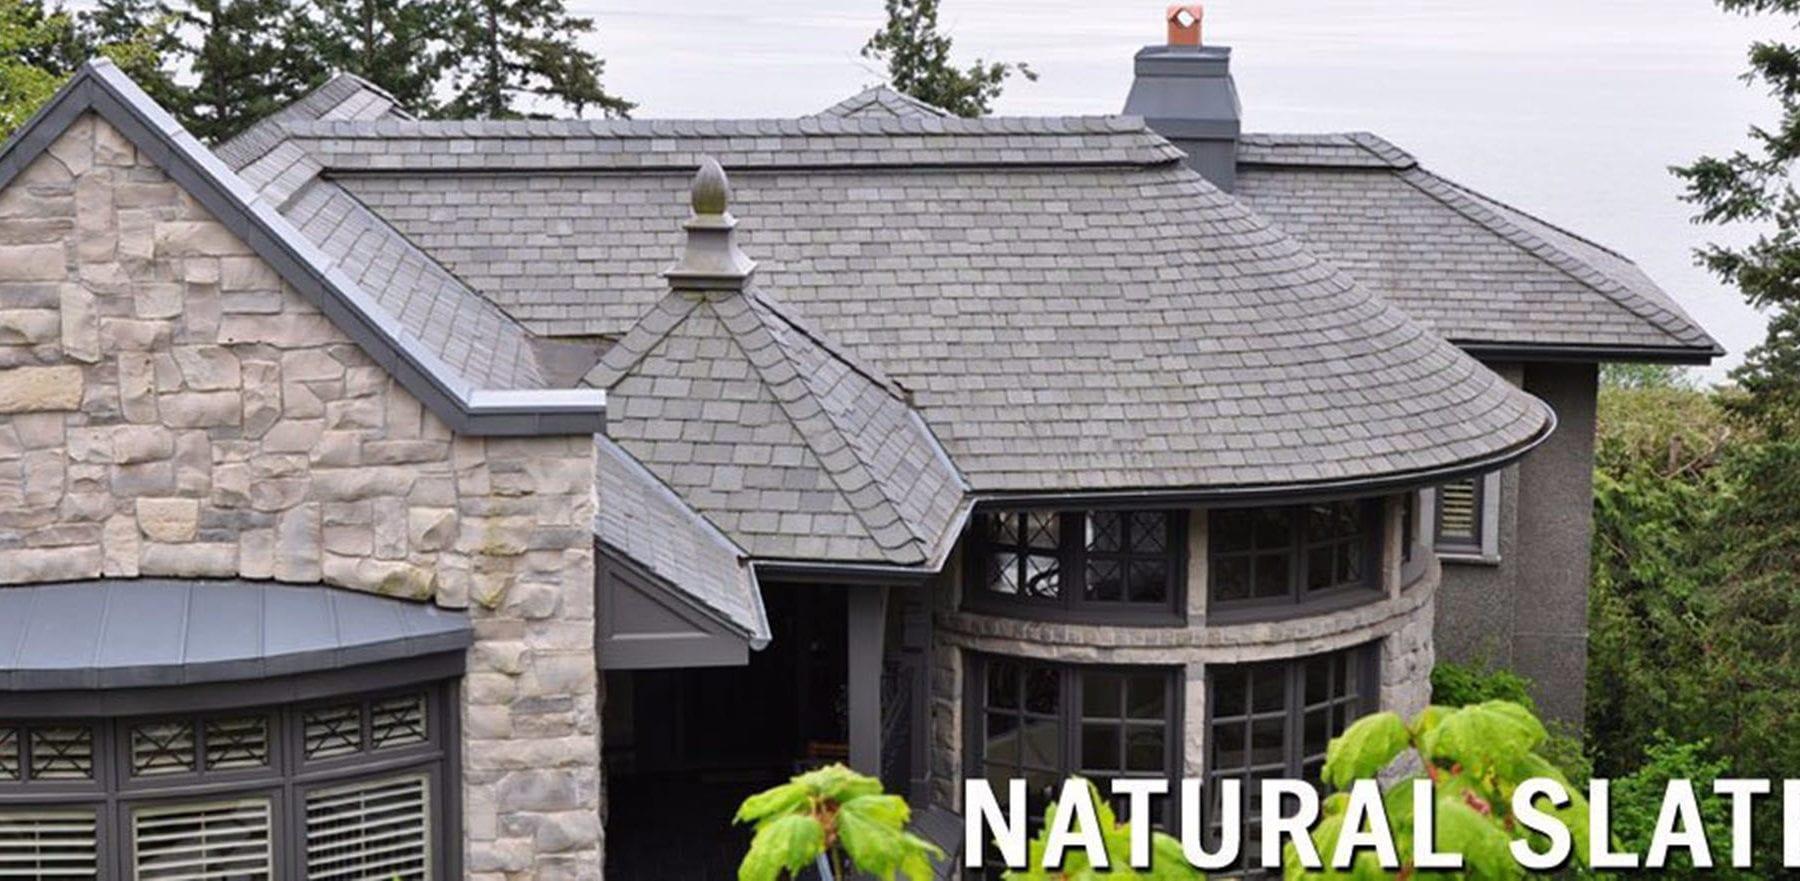 Lifestiles - Canadian Natural Slate Roof Tiles - Various, England 3